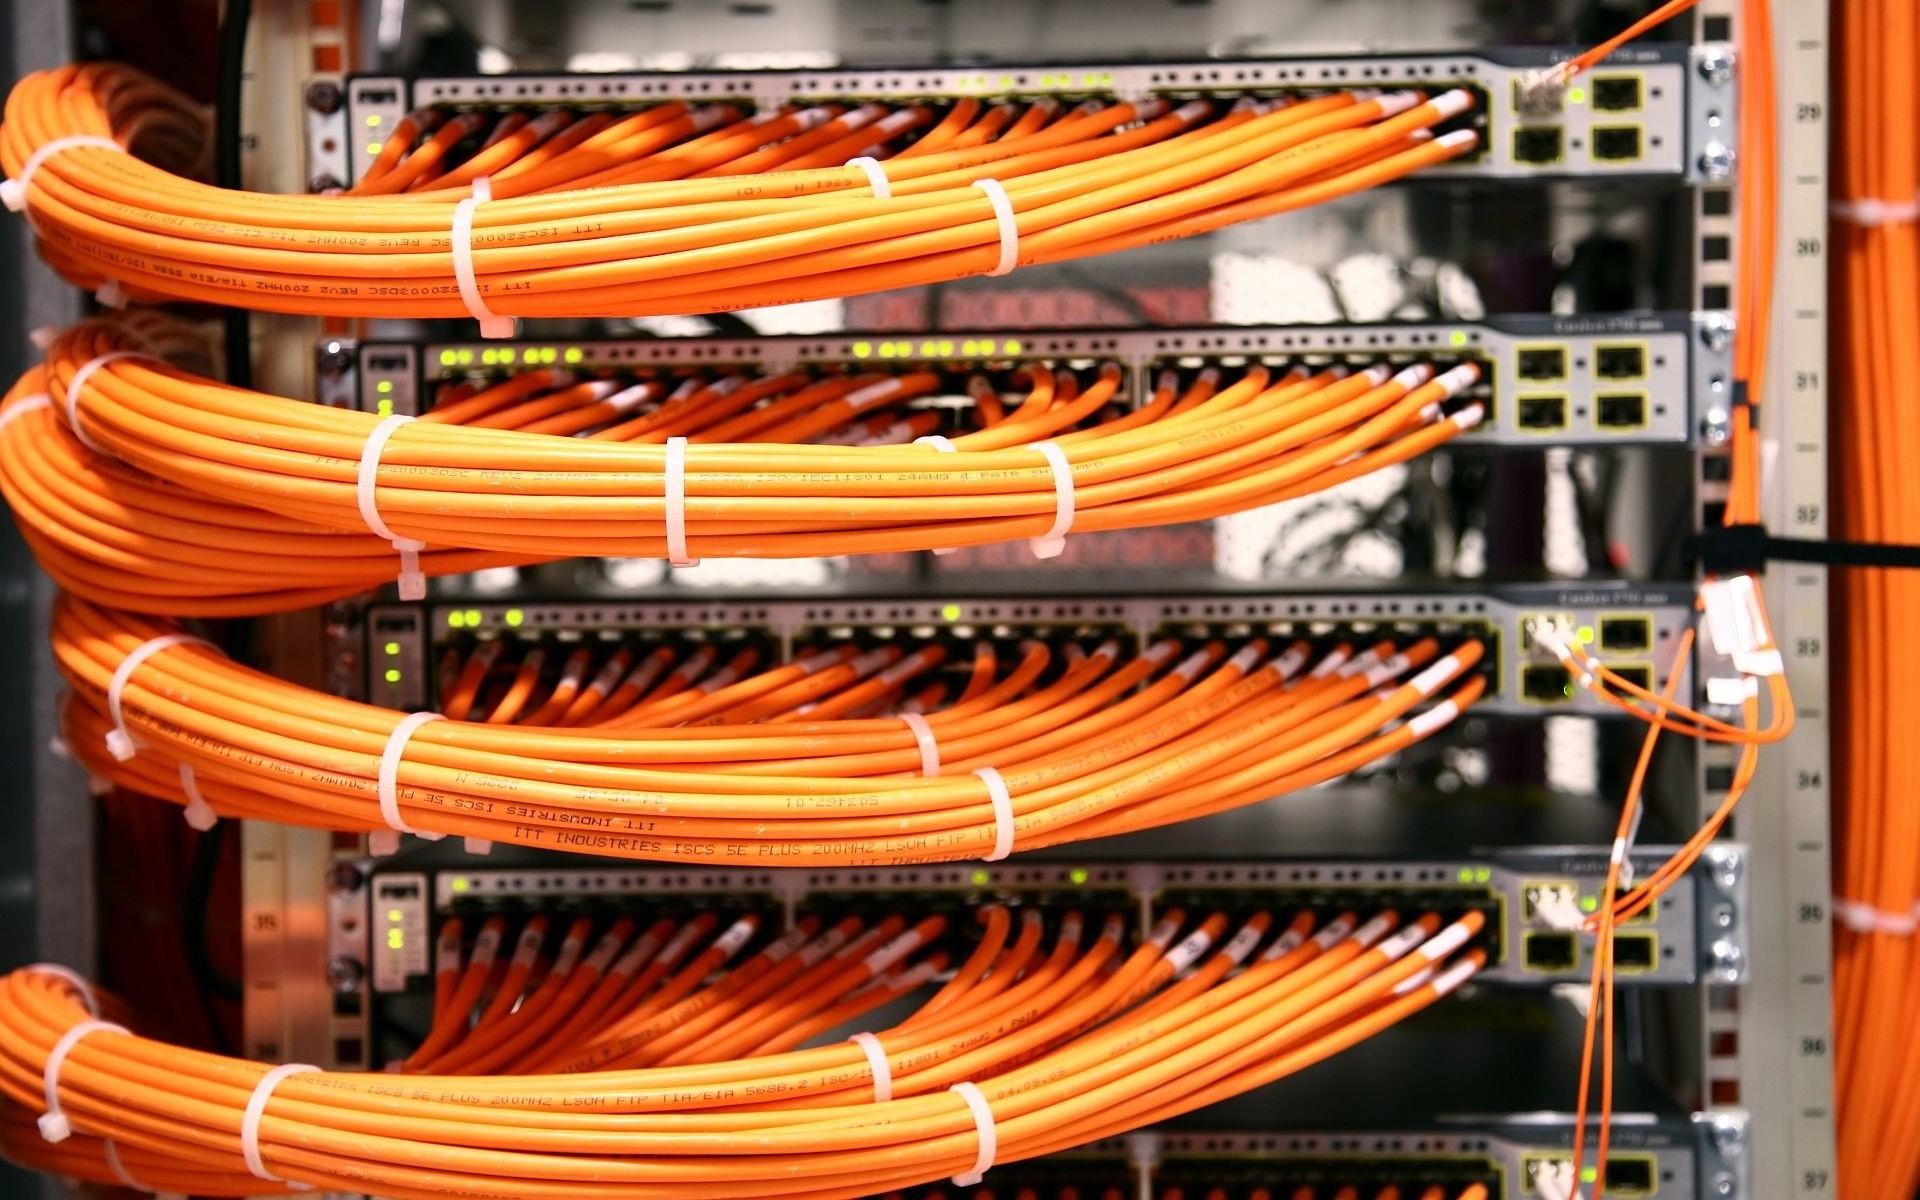 Server ethernet cables